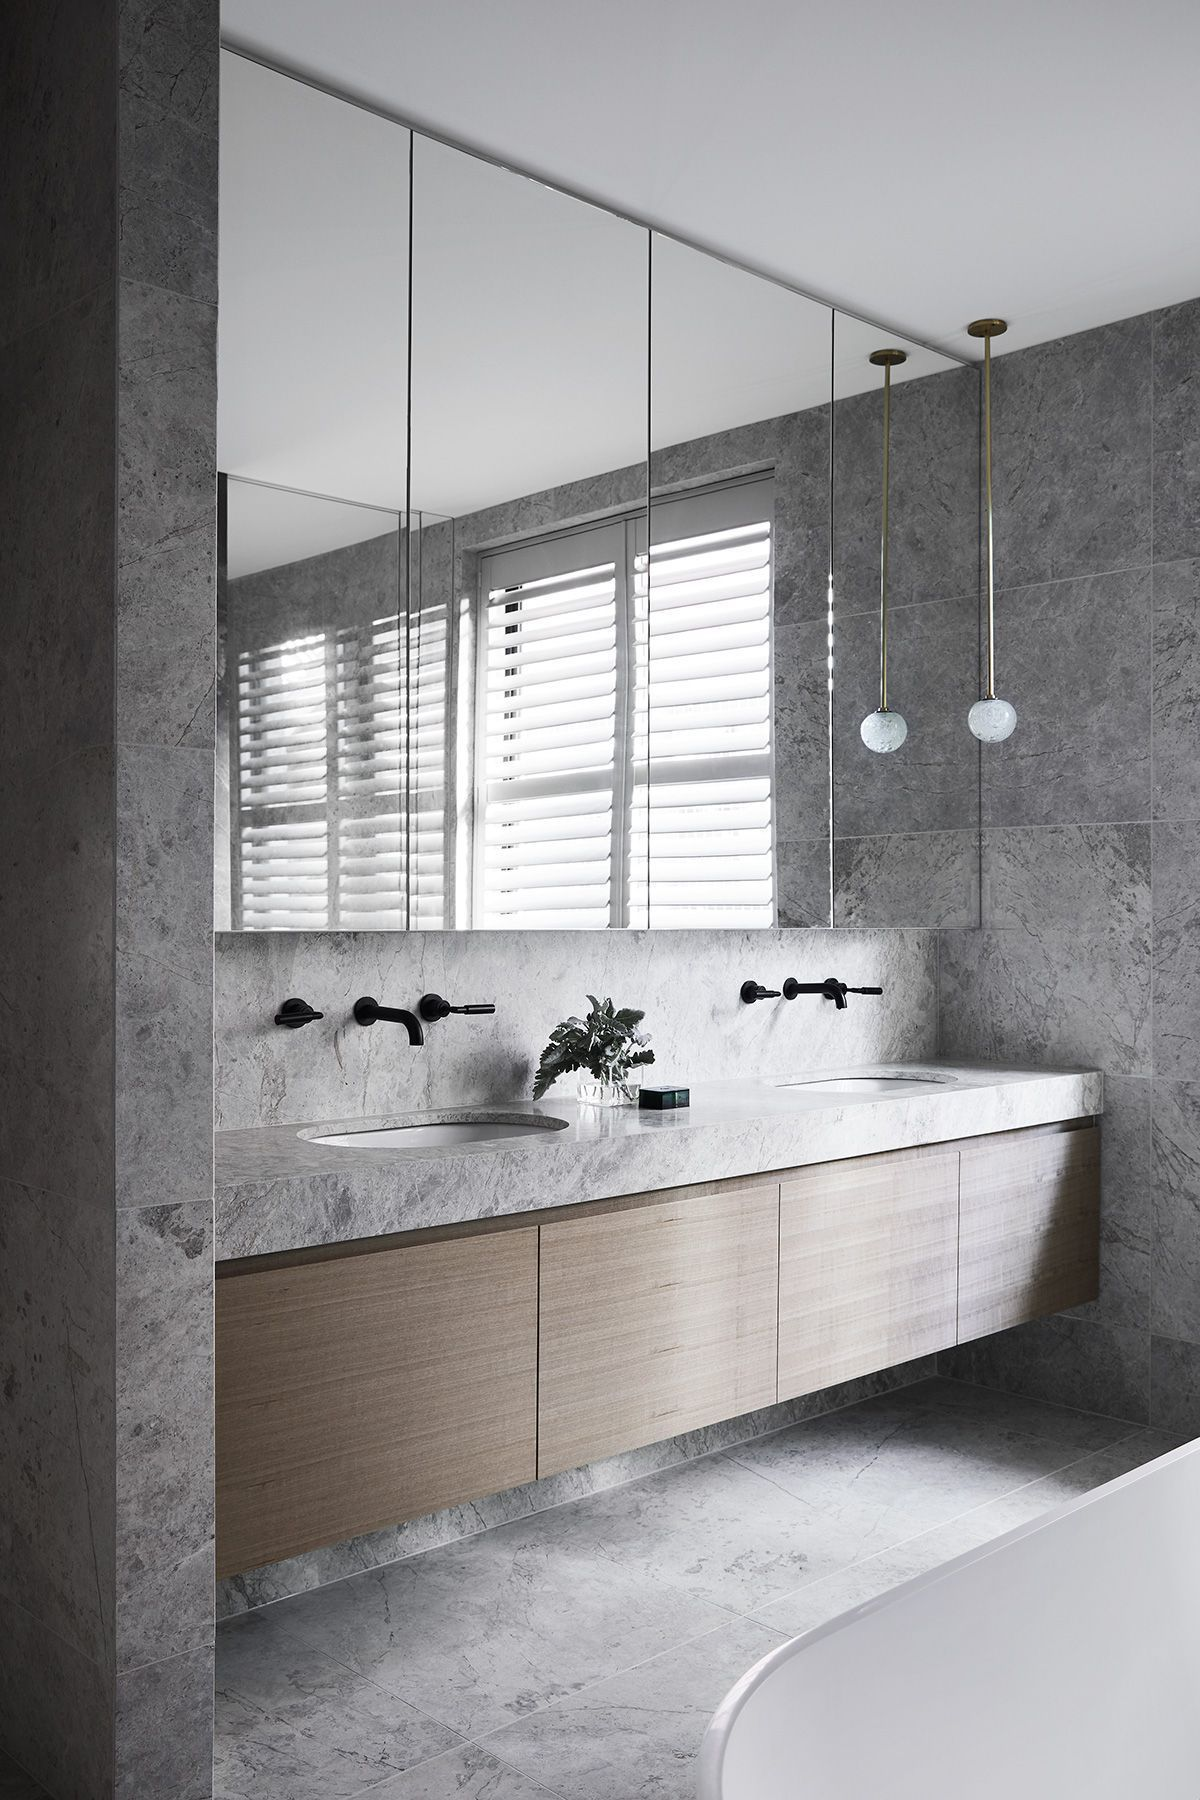 Home interior designer salary decoration ideas living room design homeinterior also rh pinterest